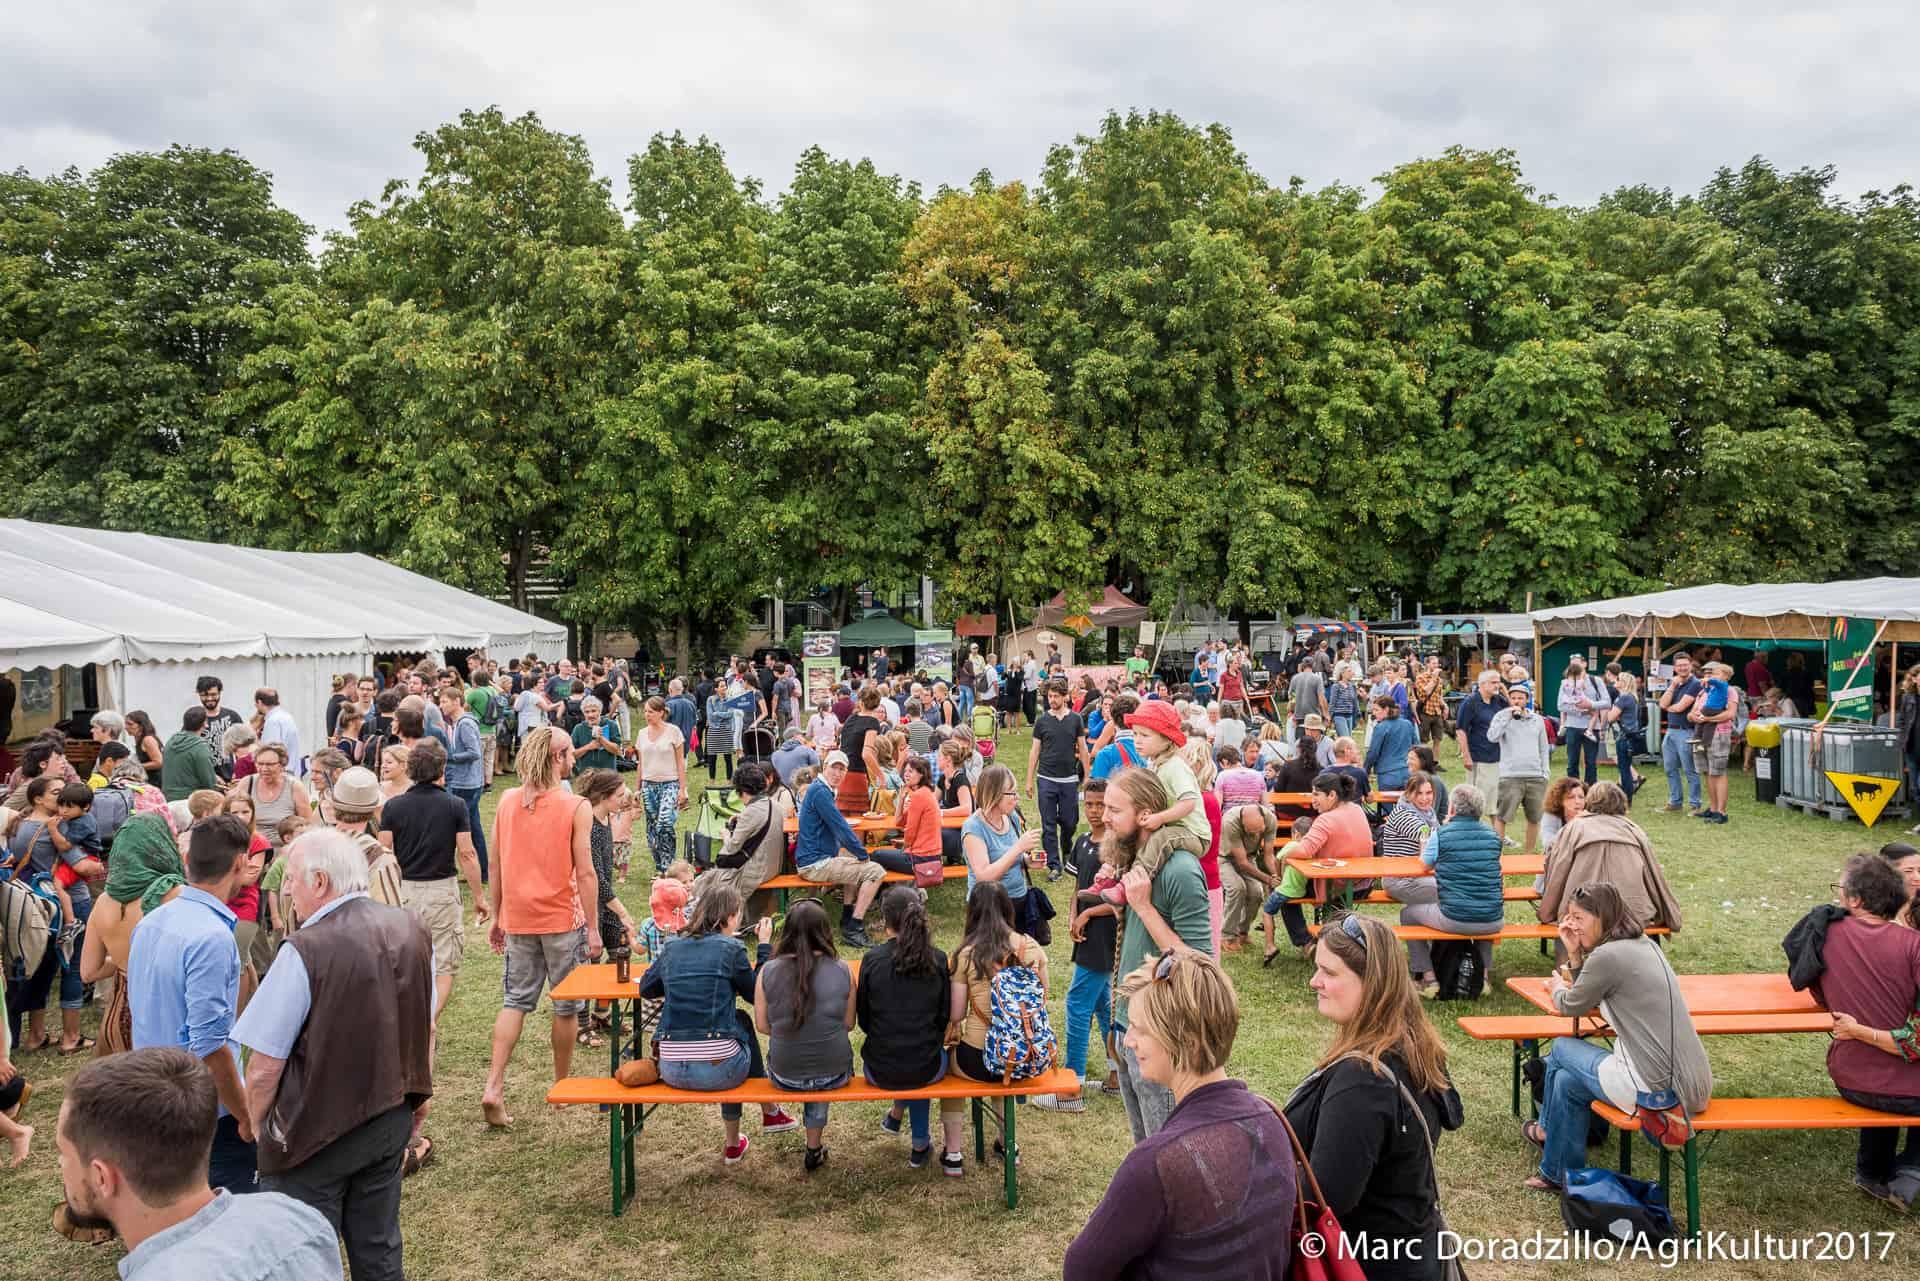 20.07. bis 22.07. – AgriKulturFestival in Freiburg